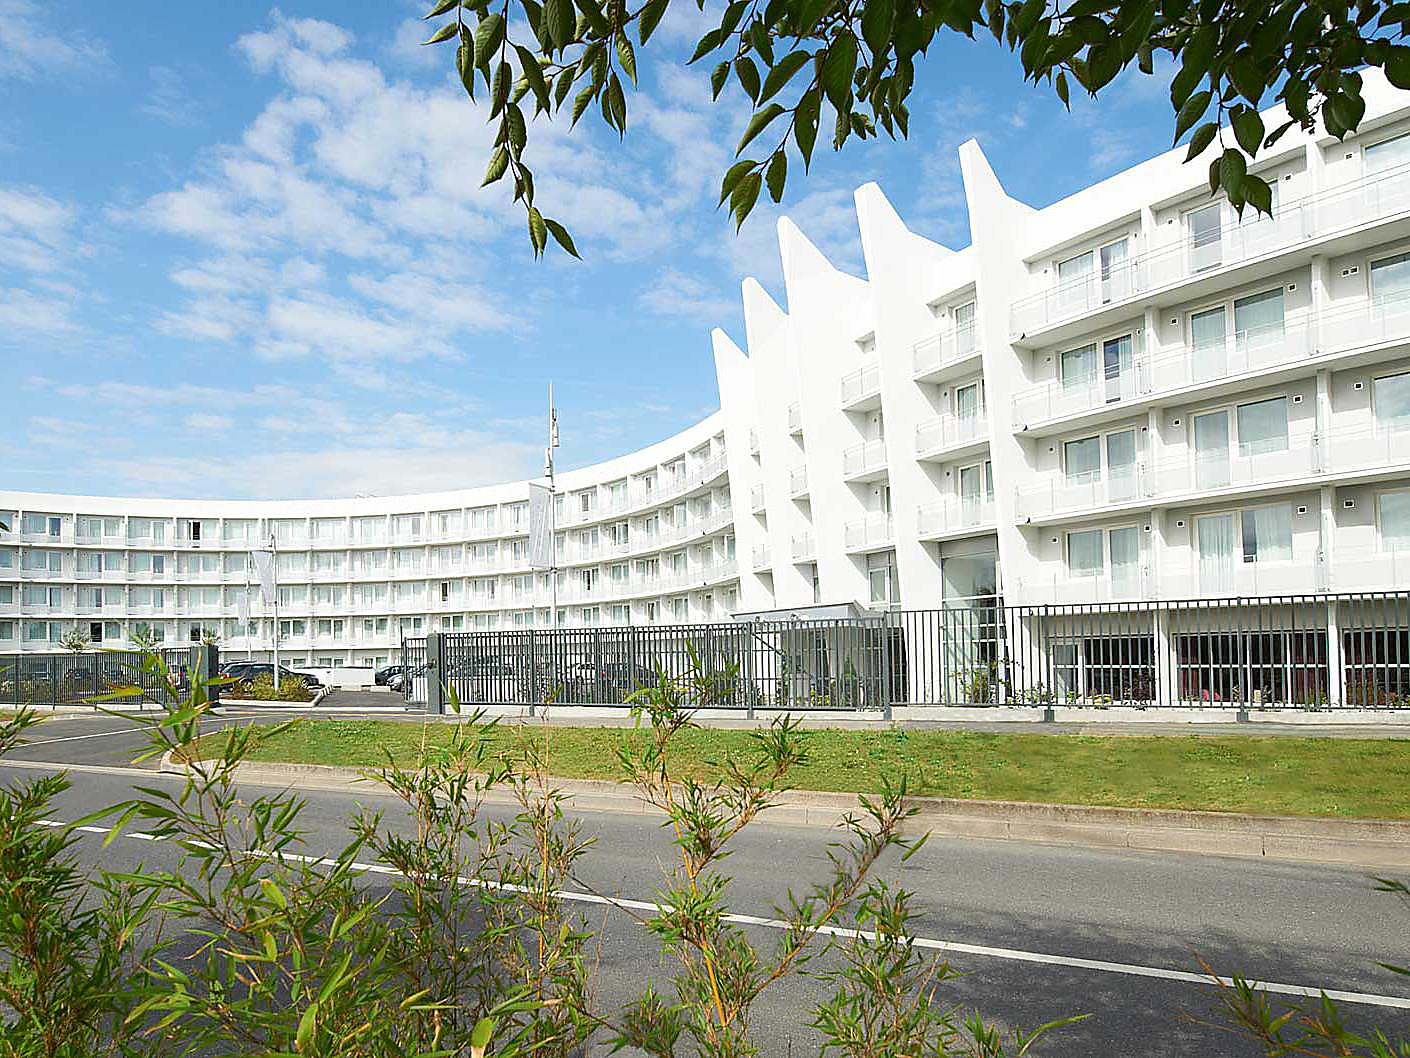 Airport Hotel: Crowne Plaza Paris - Charles de Gaulle